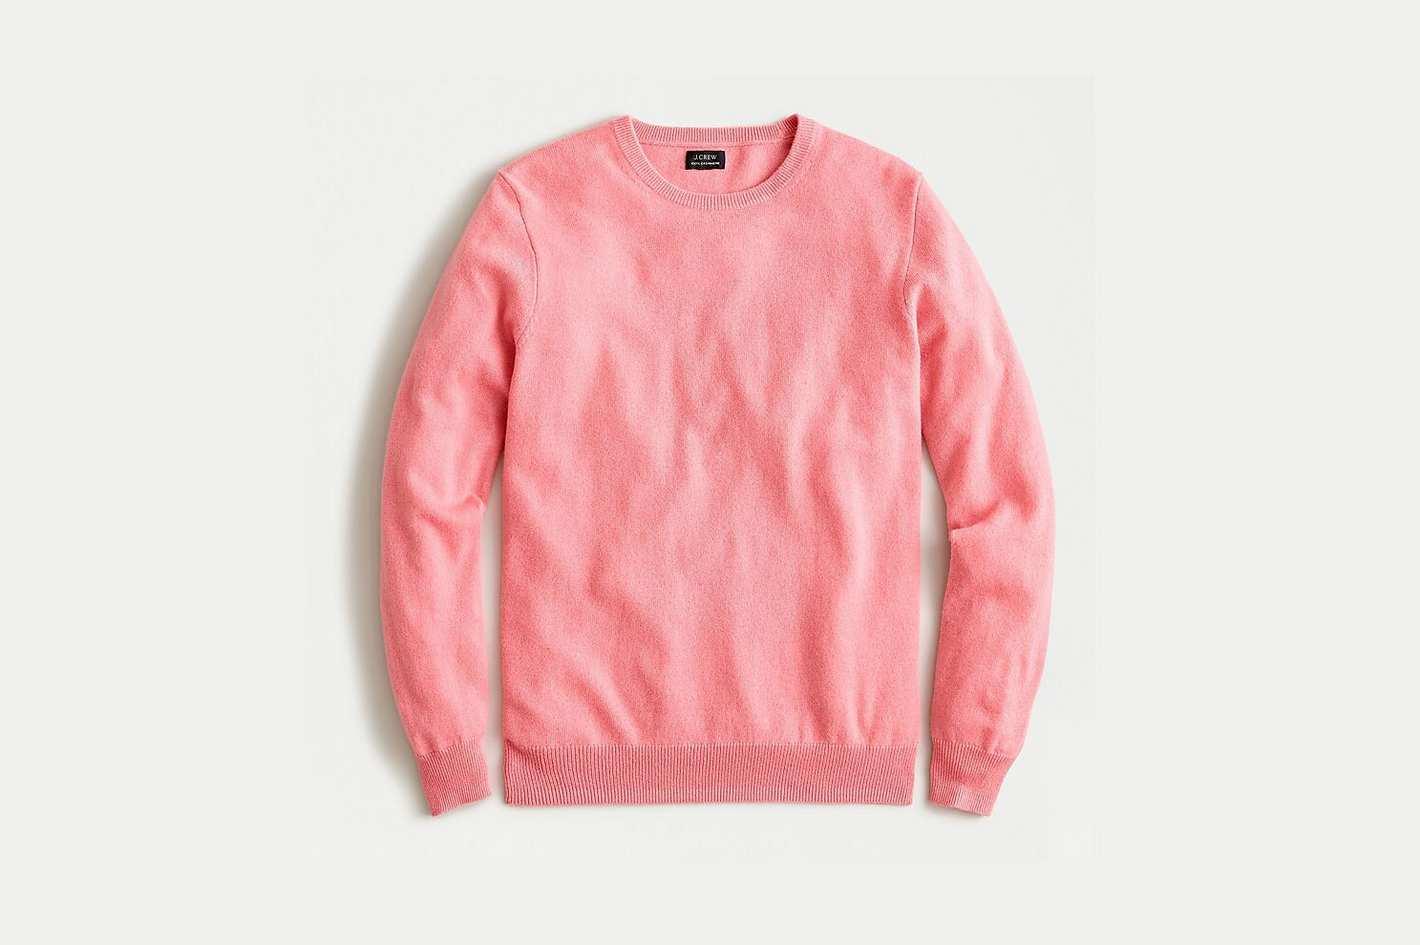 J. Crew Everyday Cashmere Crewneck Sweater